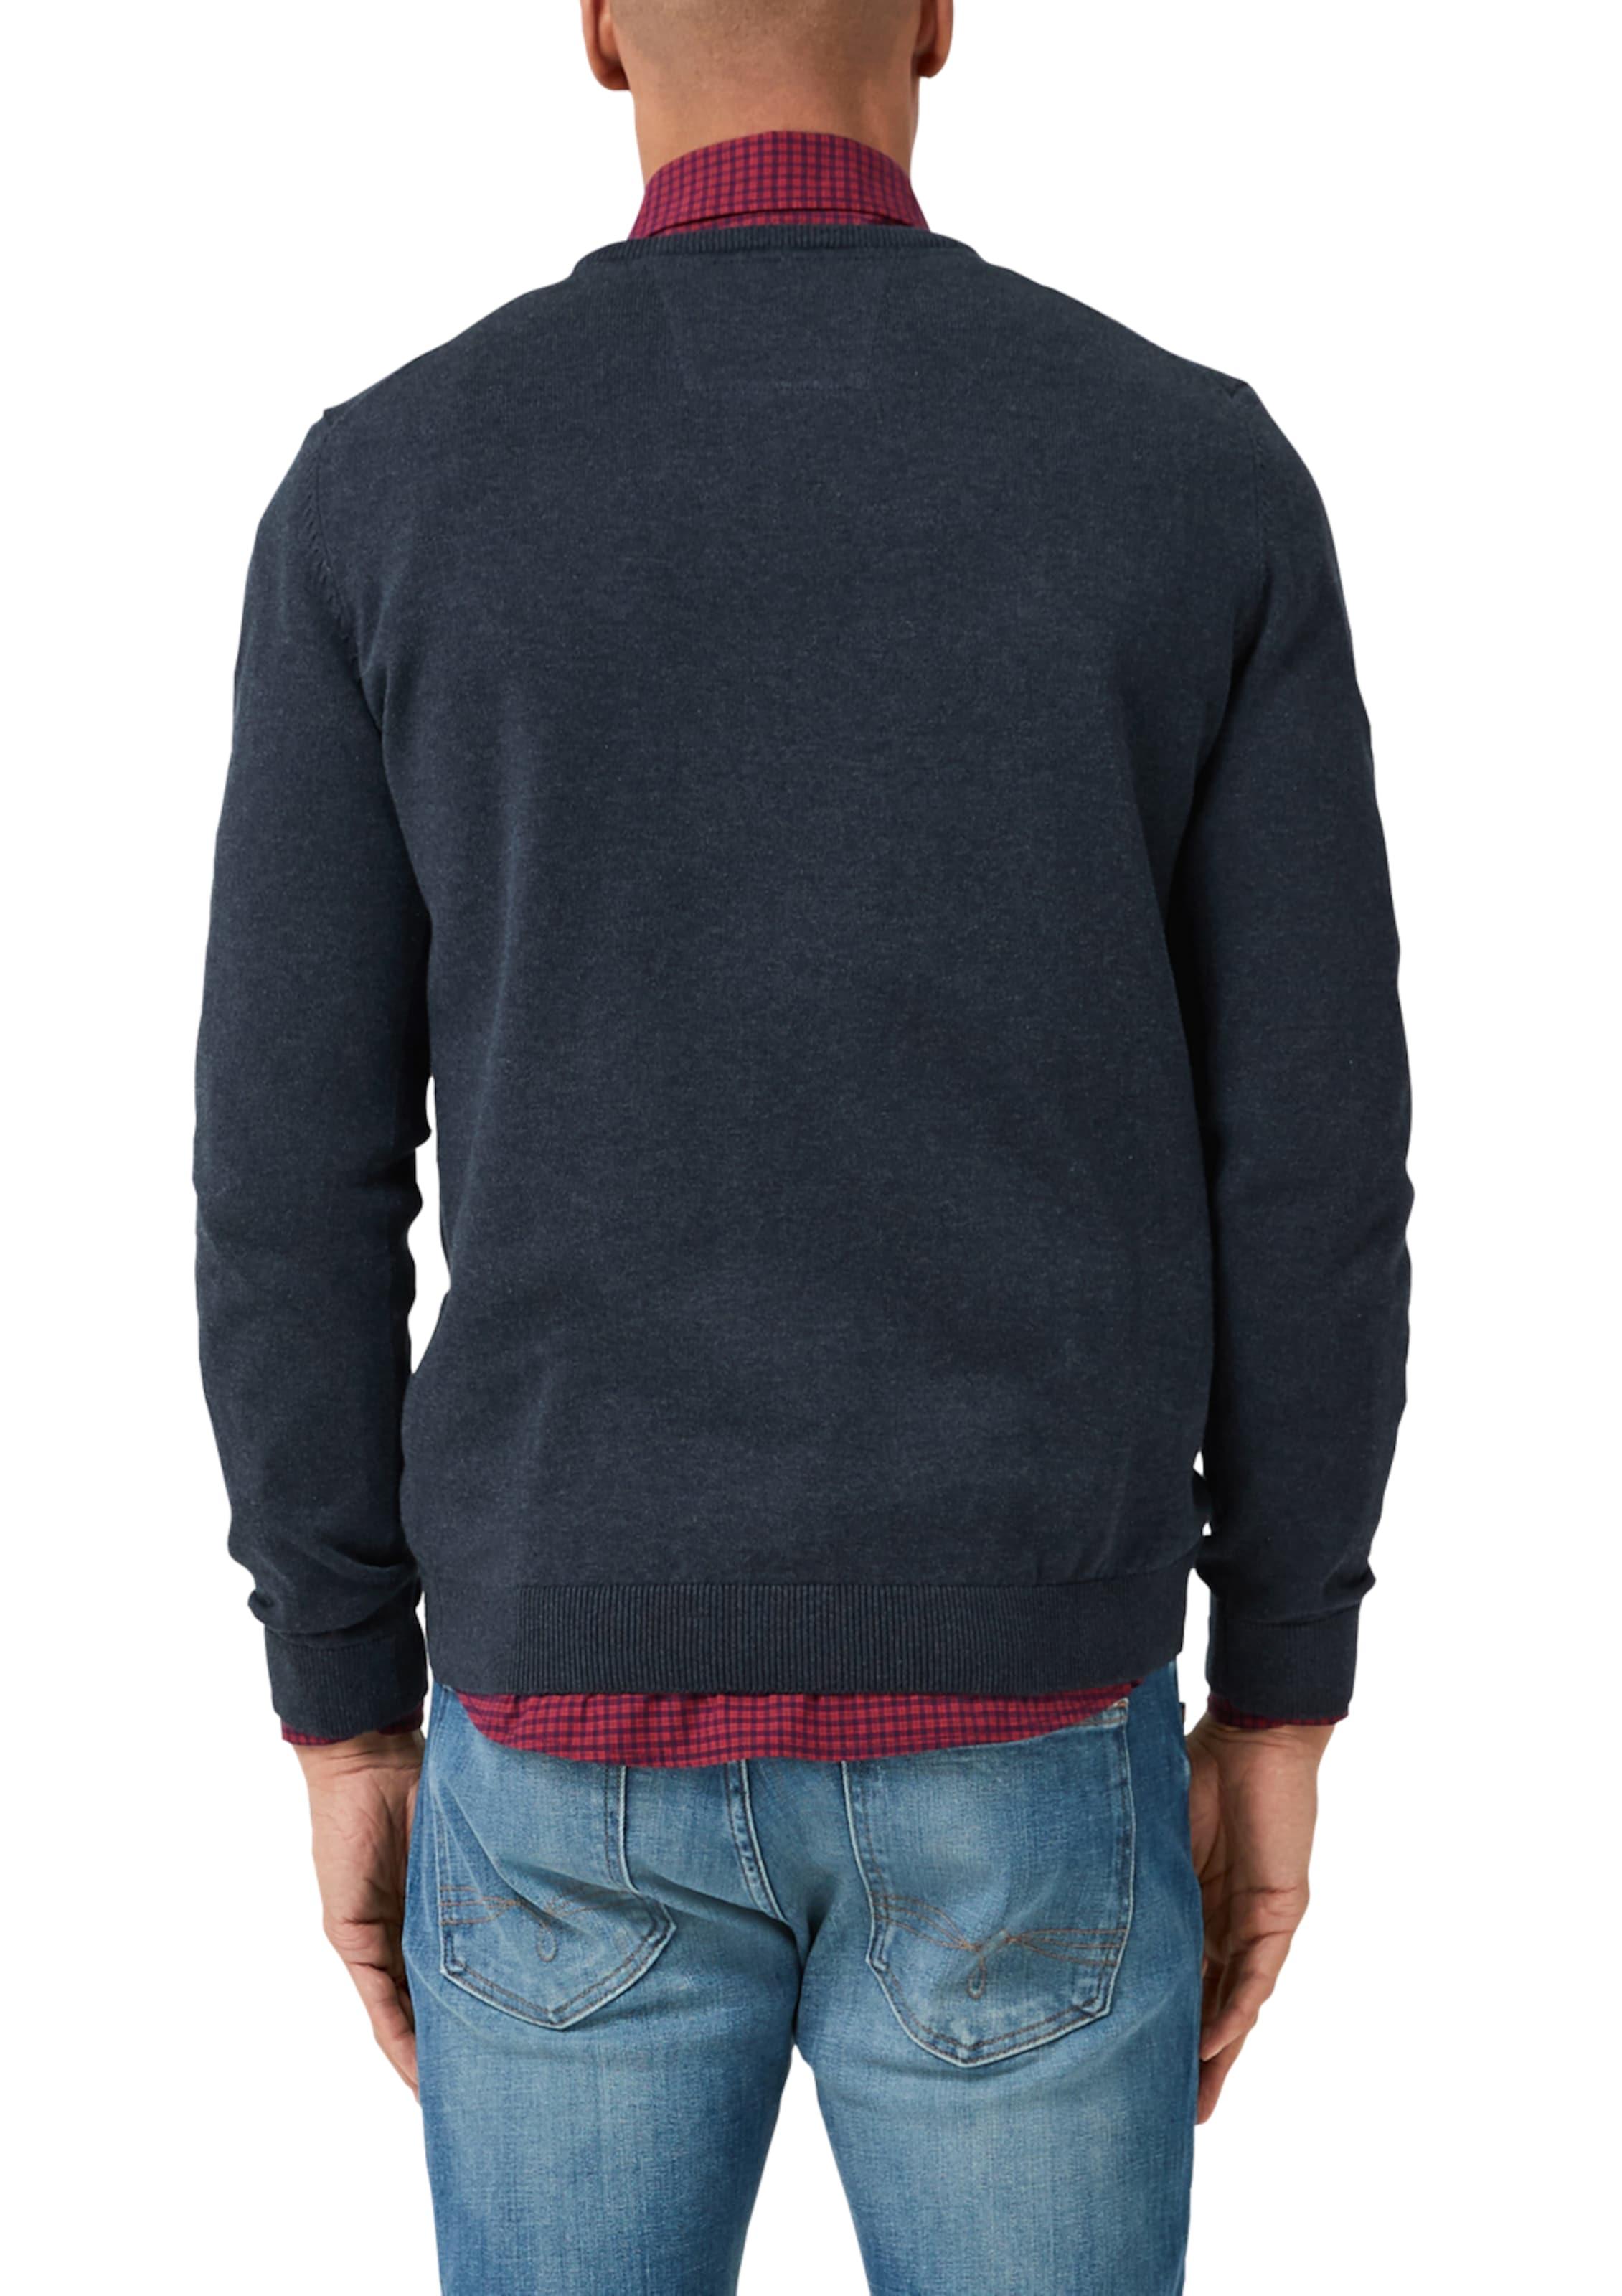 S oliver Crew Neck Label In Red Pullover Mit Dunkelblau WBQxoerCEd